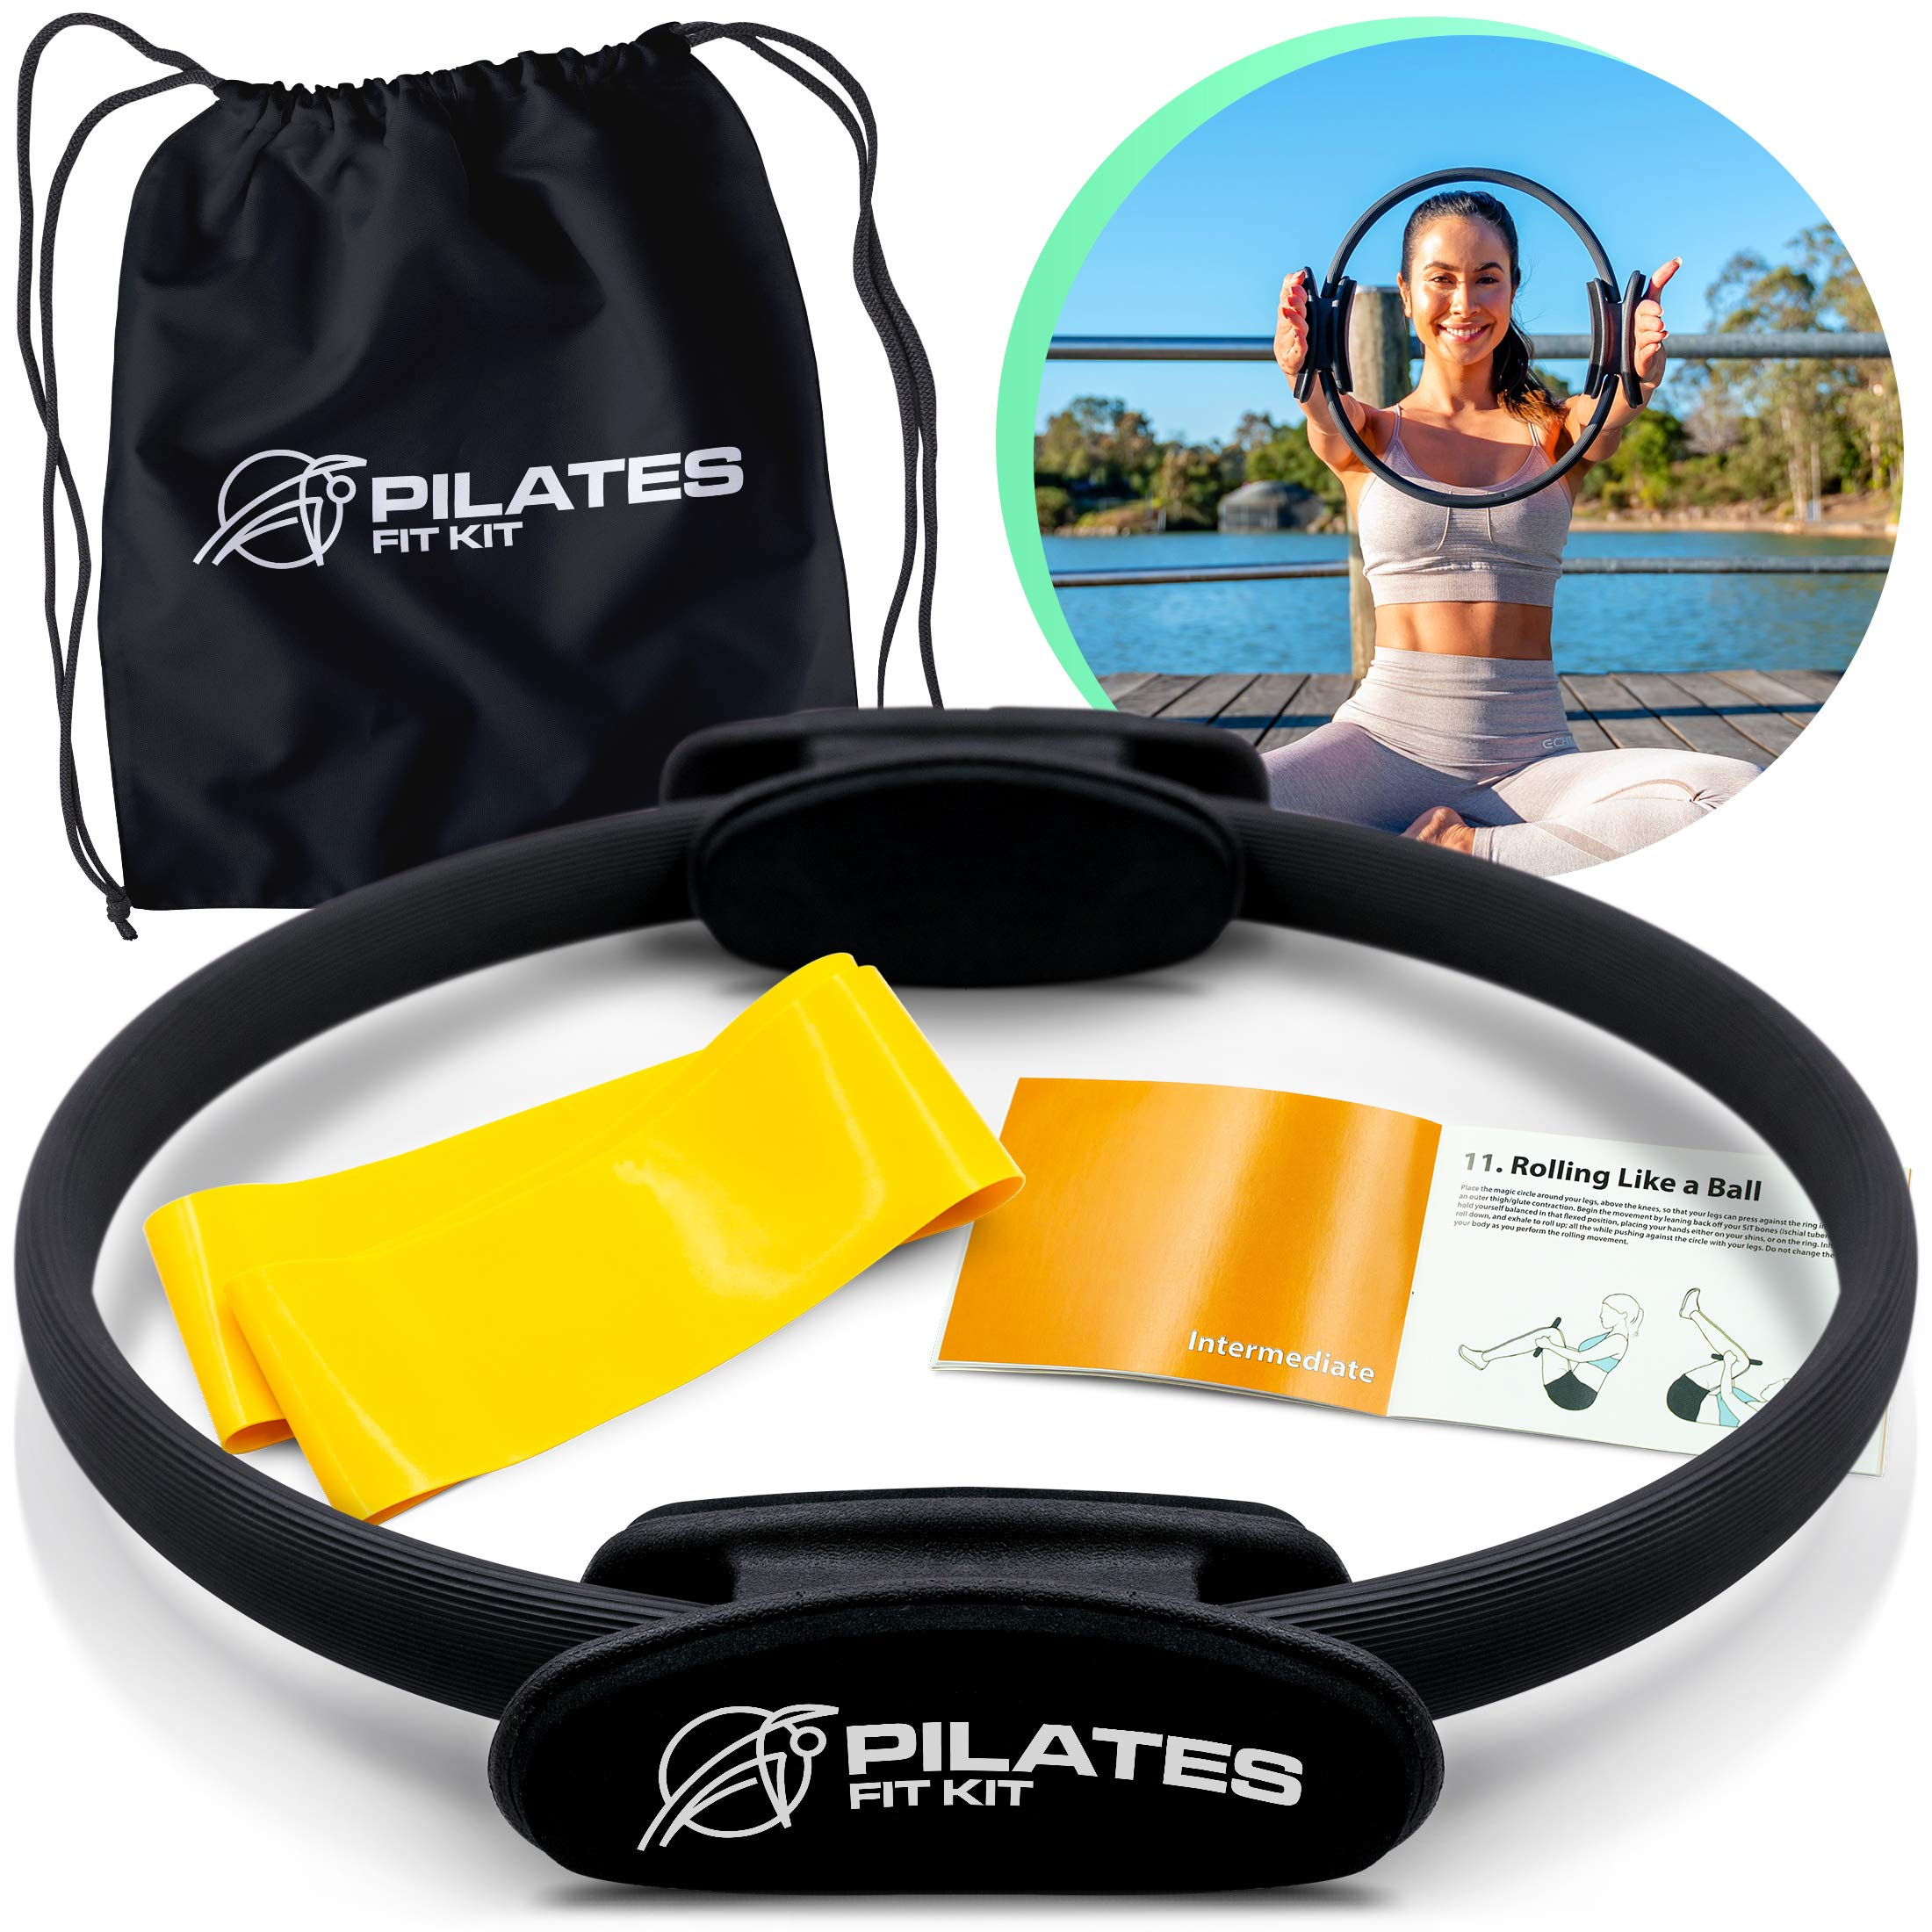 Pilates FITKIT Magic Circle Ring